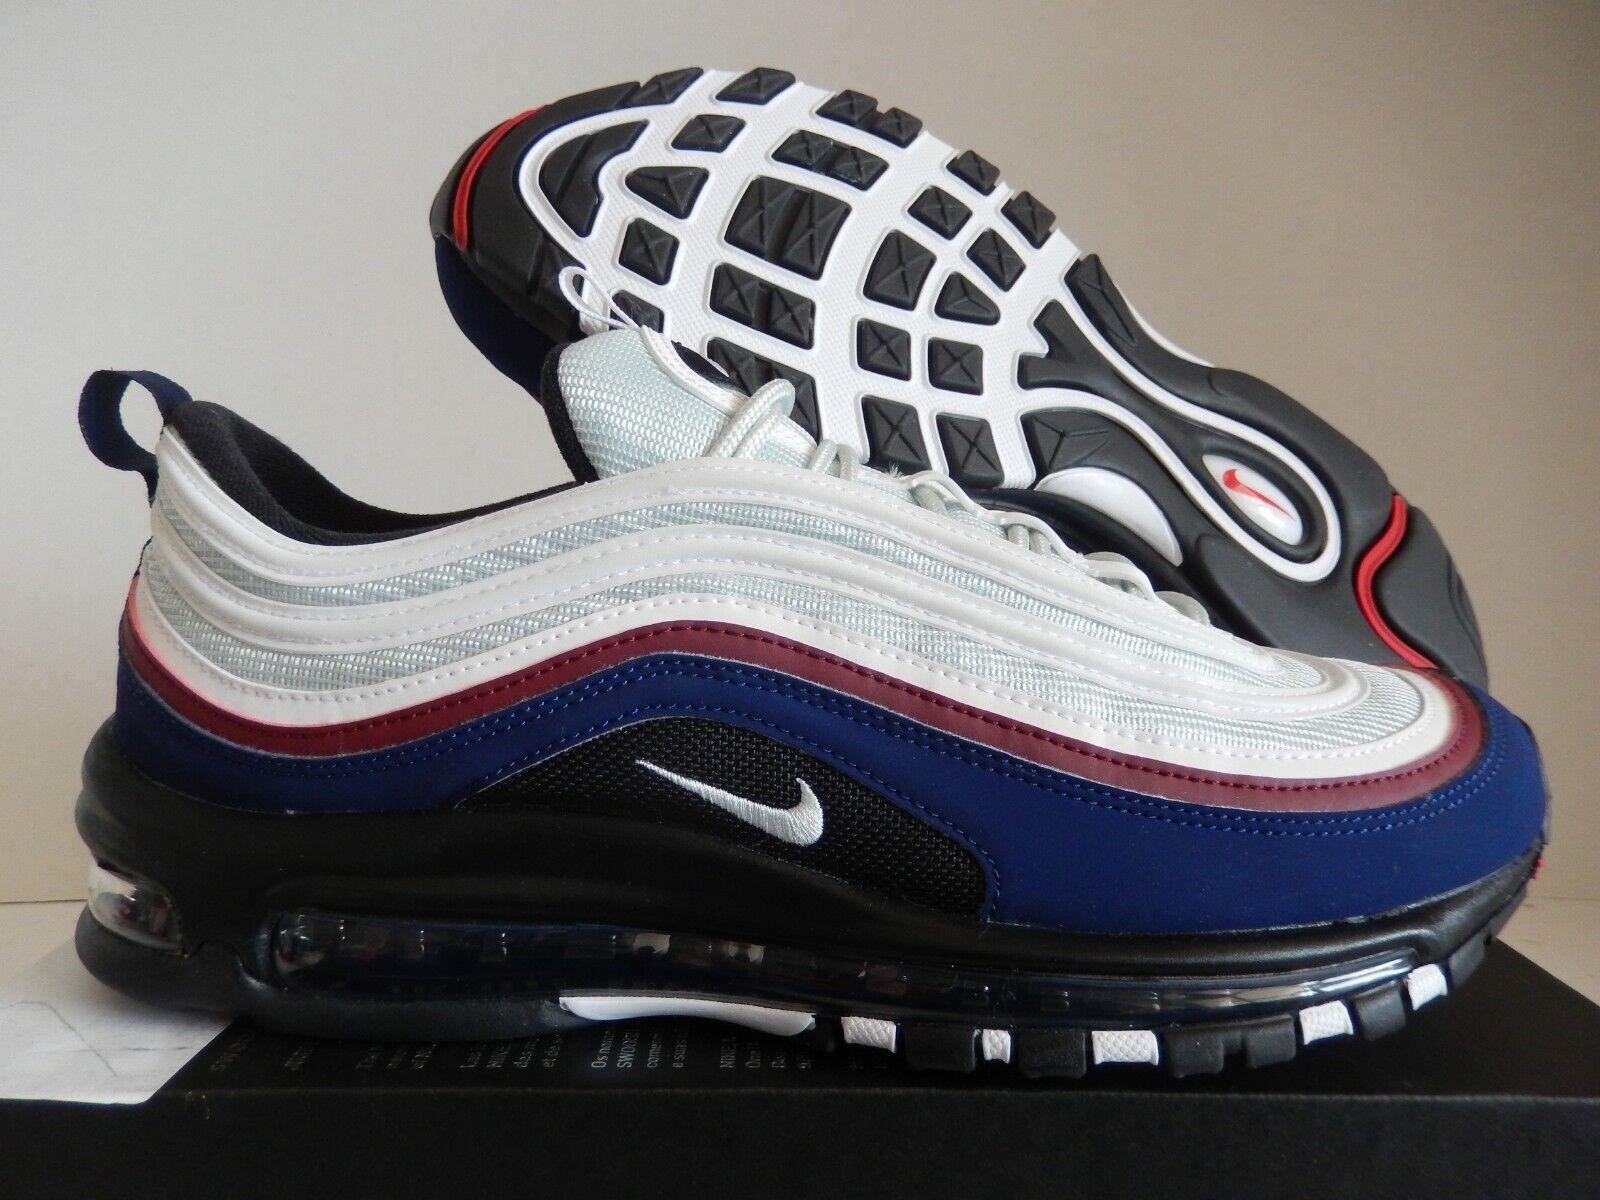 Nike Air Max 97 ID blancooo azul Team Rojo Talla 10.5